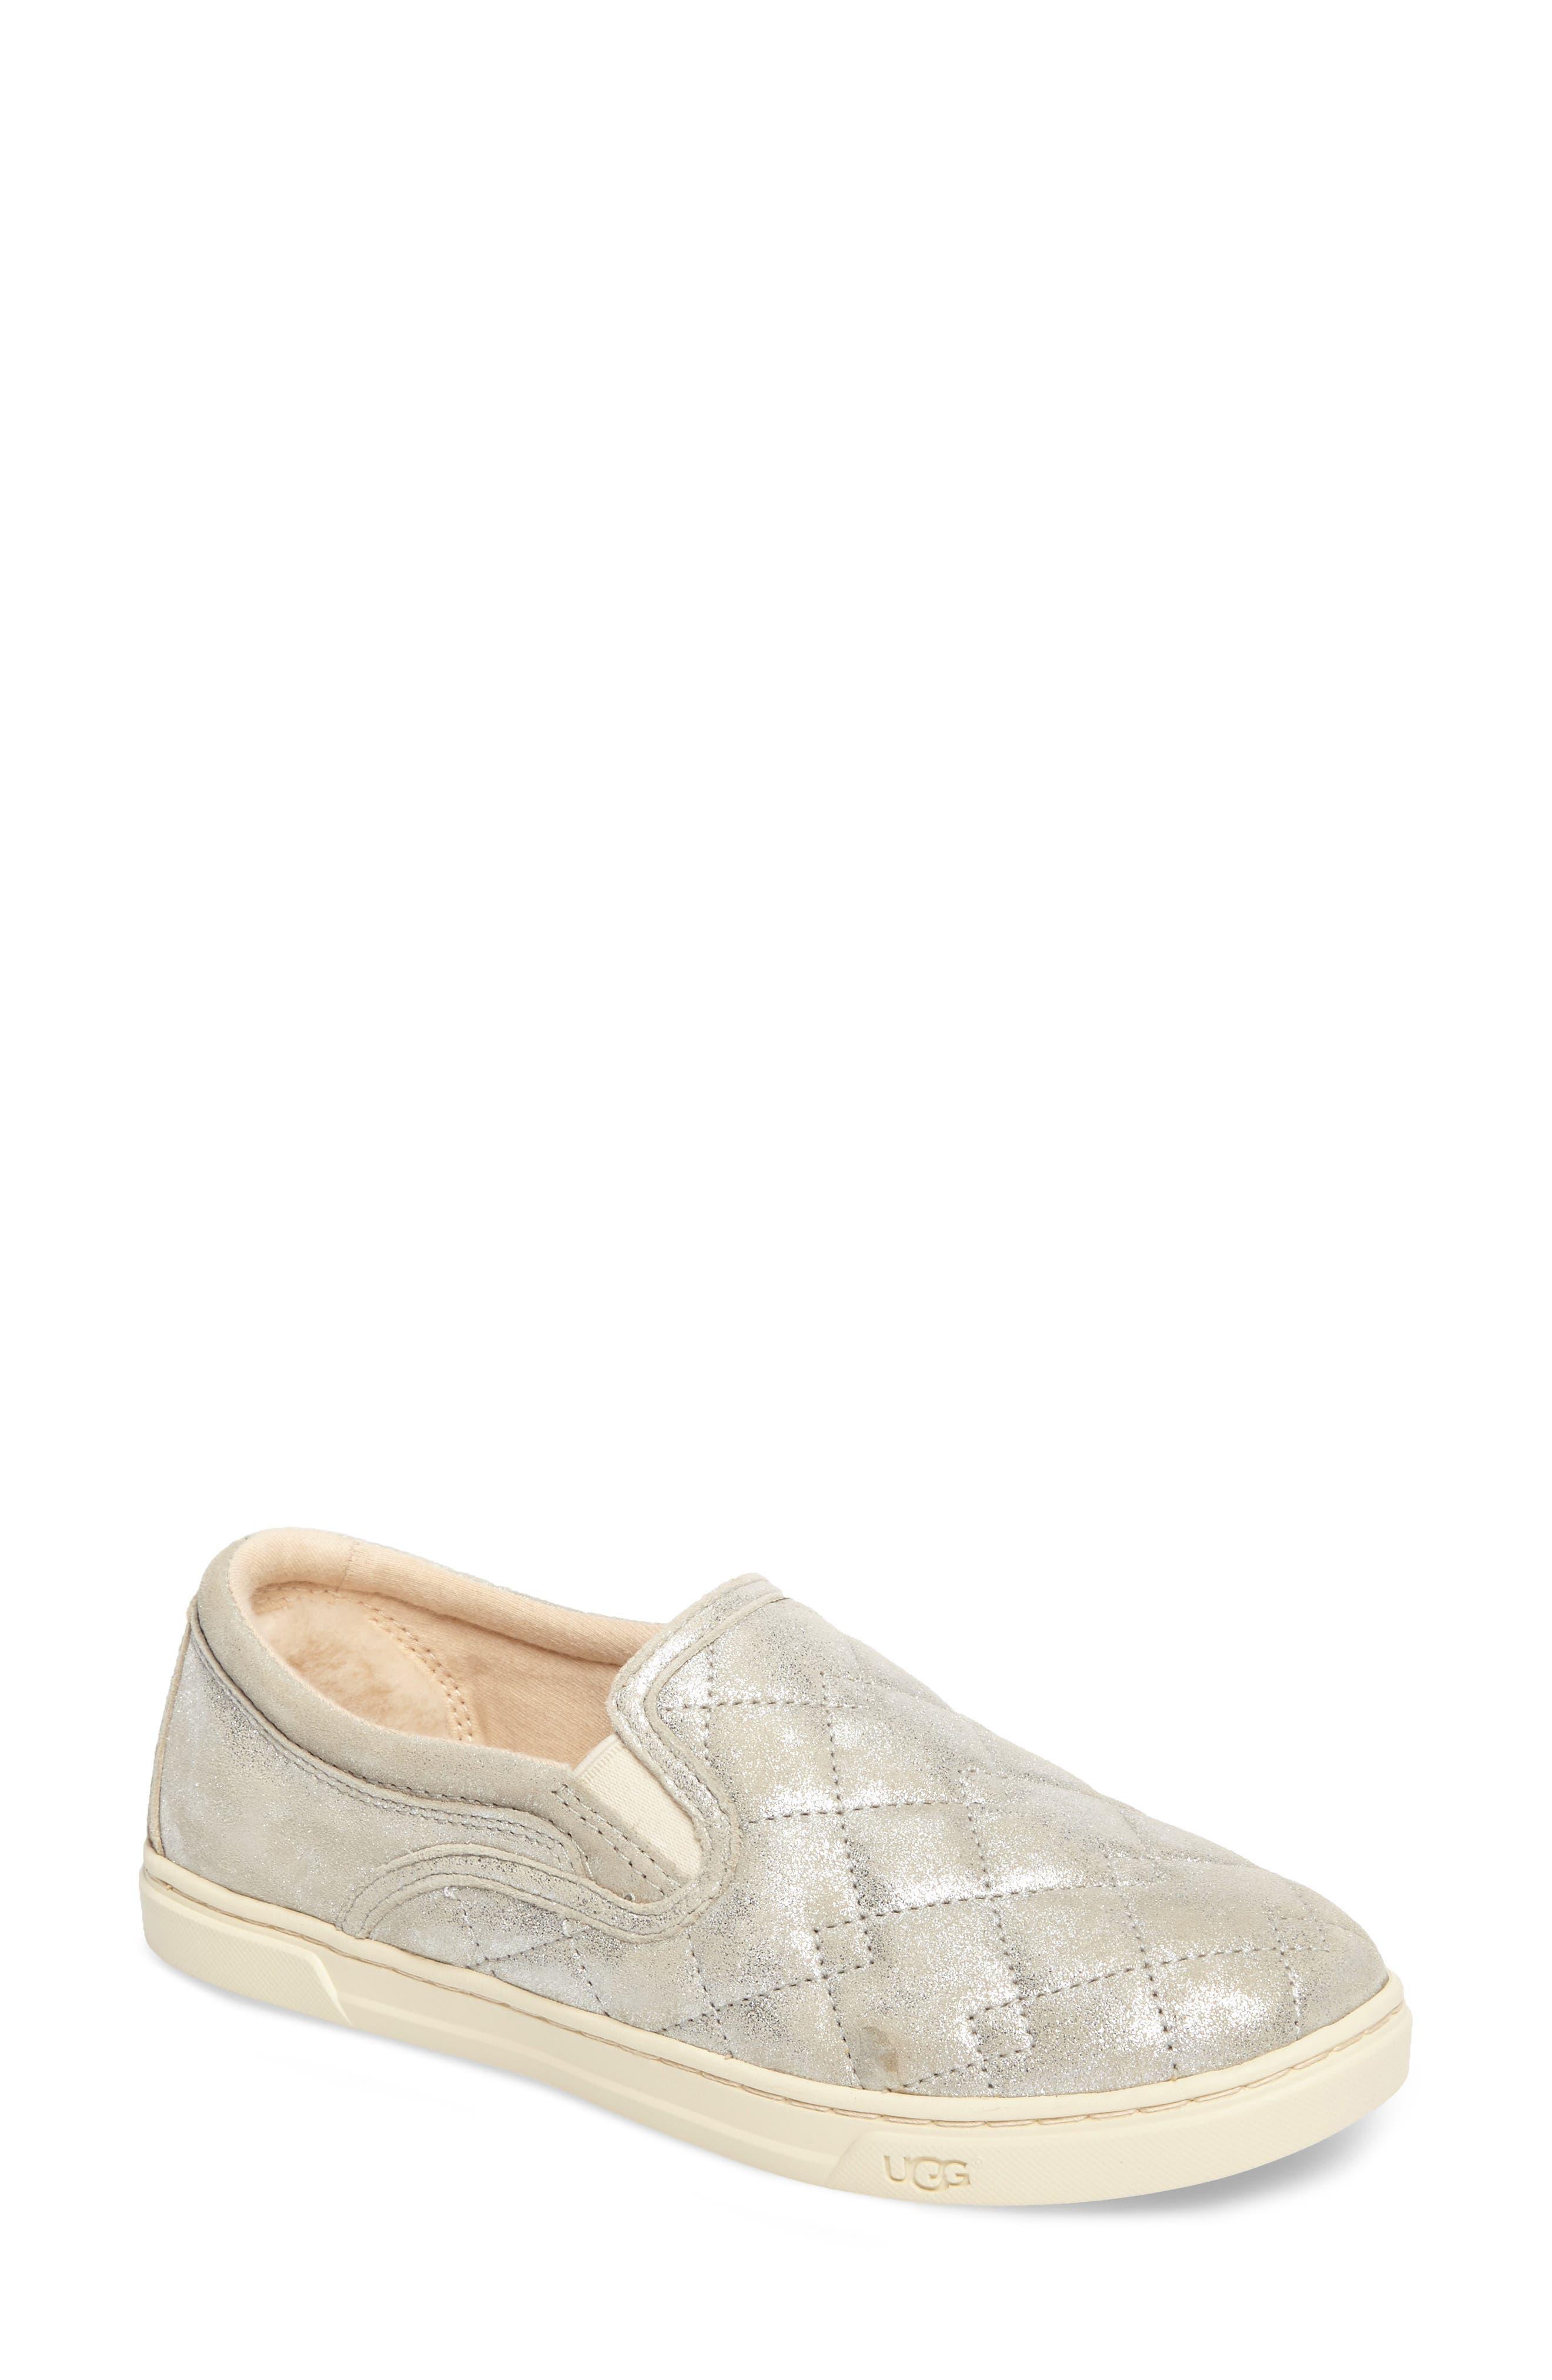 Alternate Image 1 Selected - UGG® Fierce Stardust Quilted Slip-On Sneaker (Women)